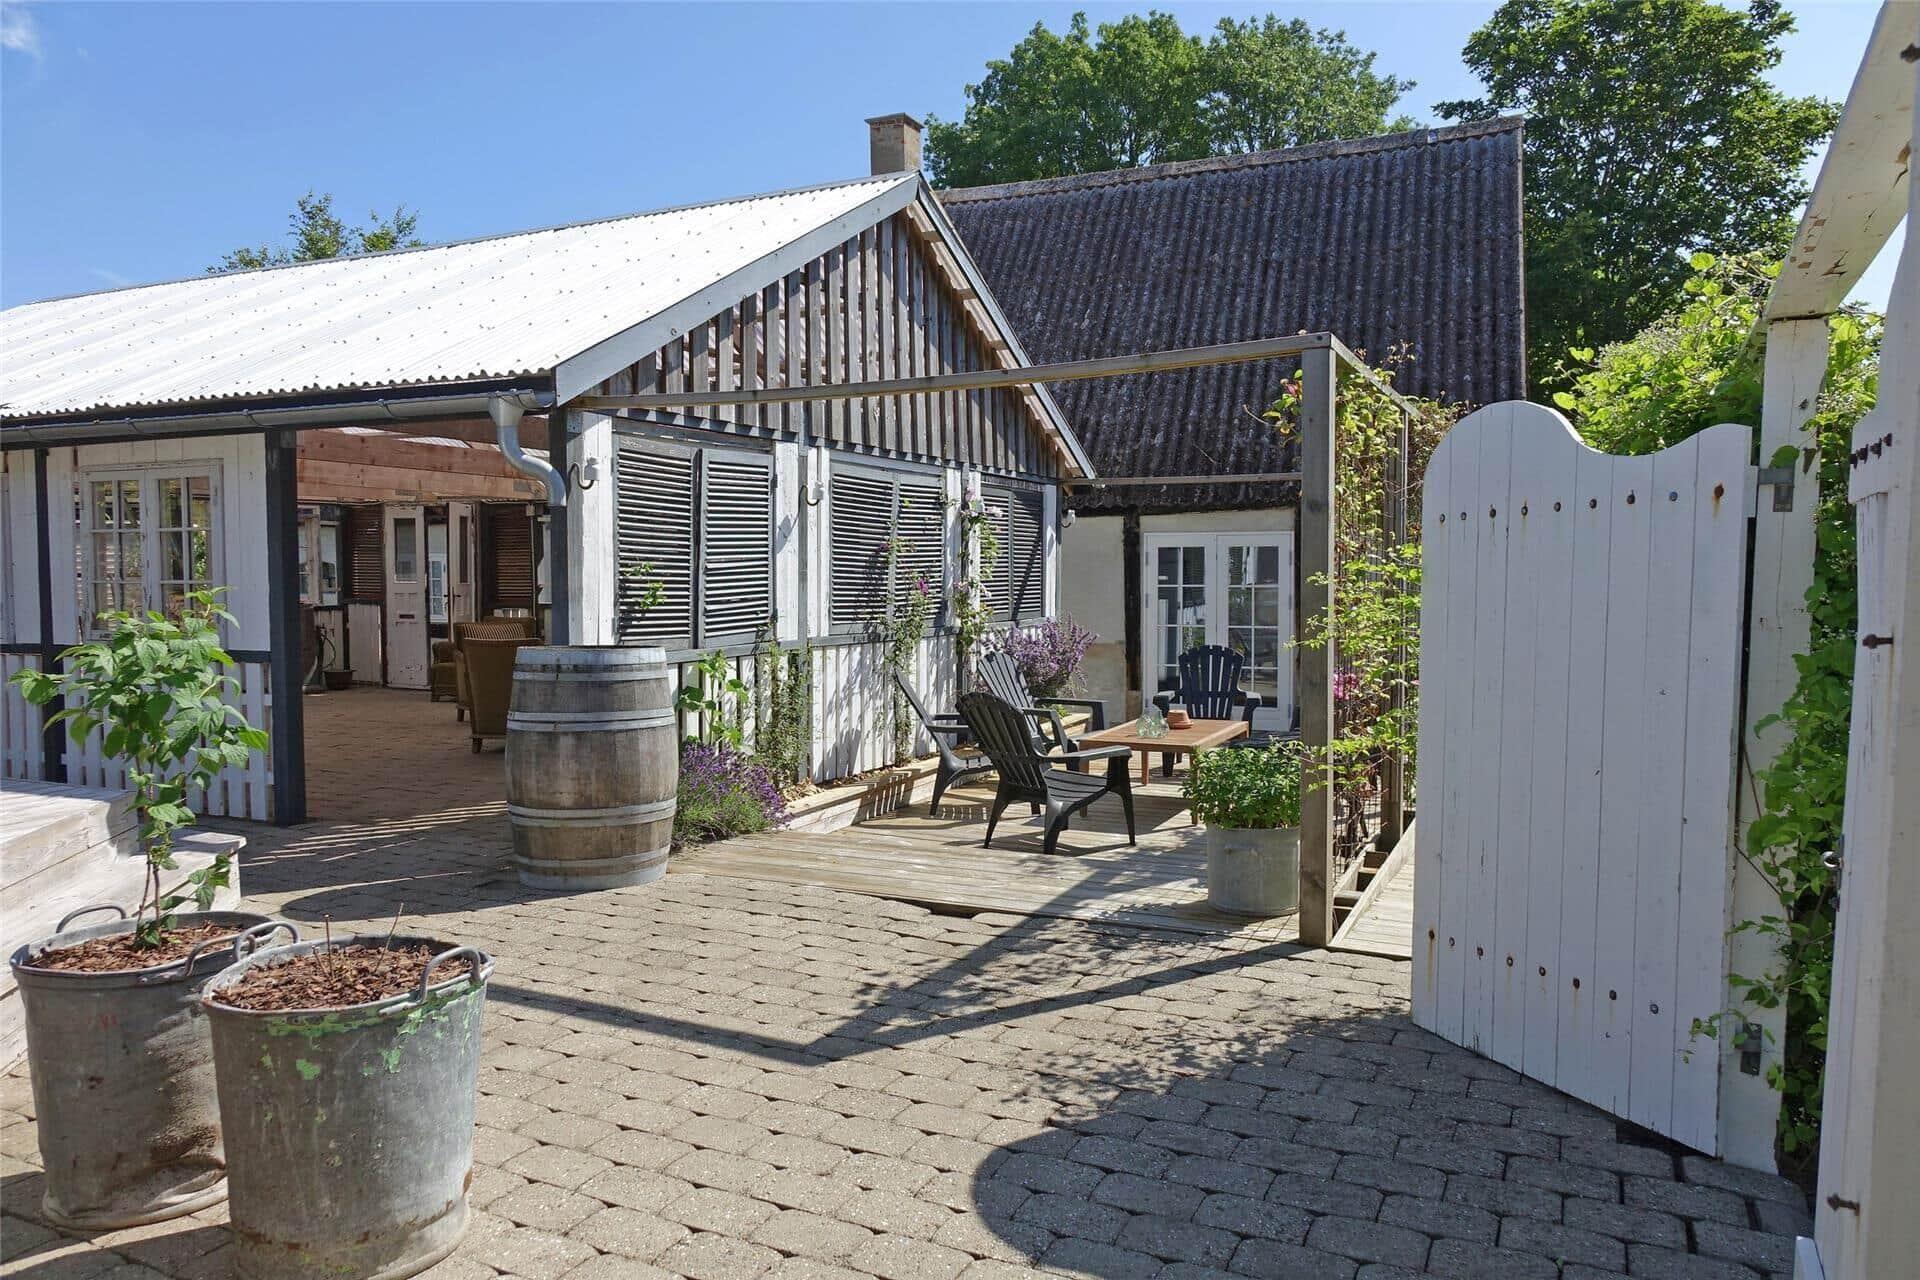 Image 1-170 Holiday-home 20319, Søndergade 9, DK - 8305 Samsø